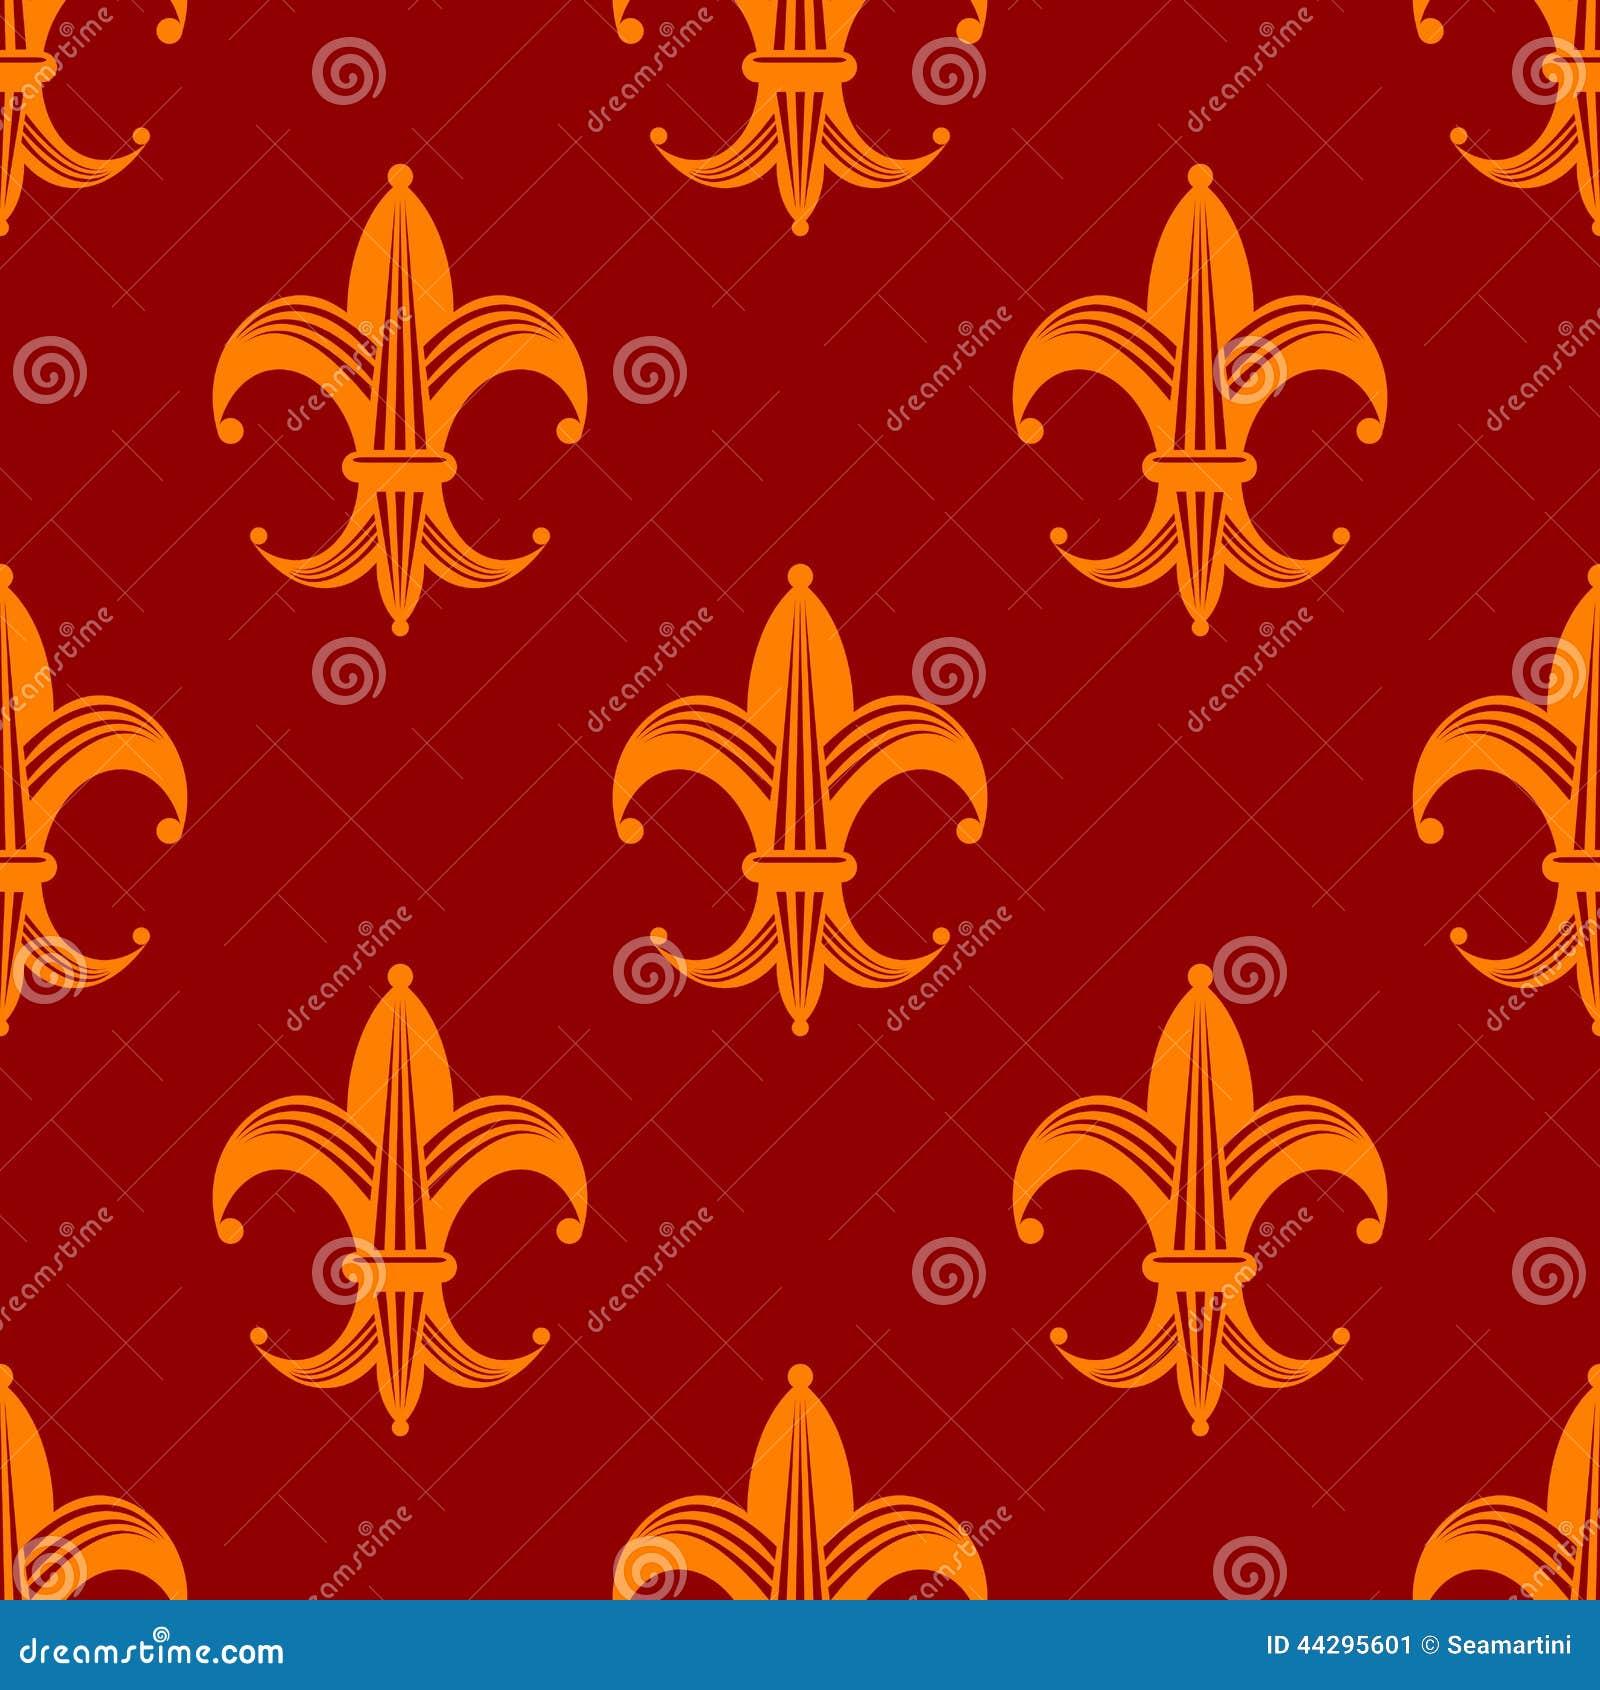 seamless fleur de lys royal orange pattern stock vector. Black Bedroom Furniture Sets. Home Design Ideas